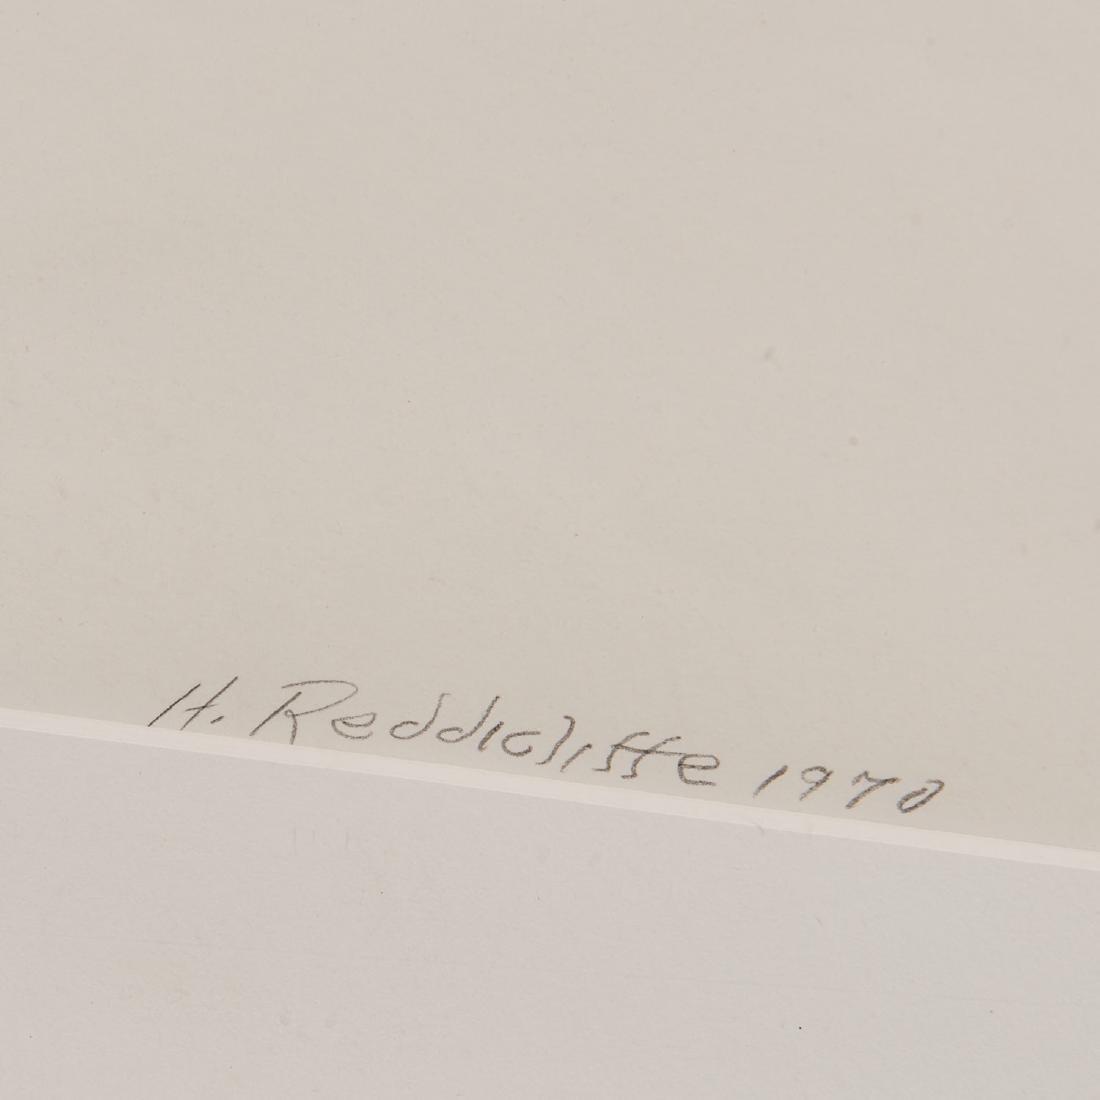 Hal Reddicliffe, drawing - 4